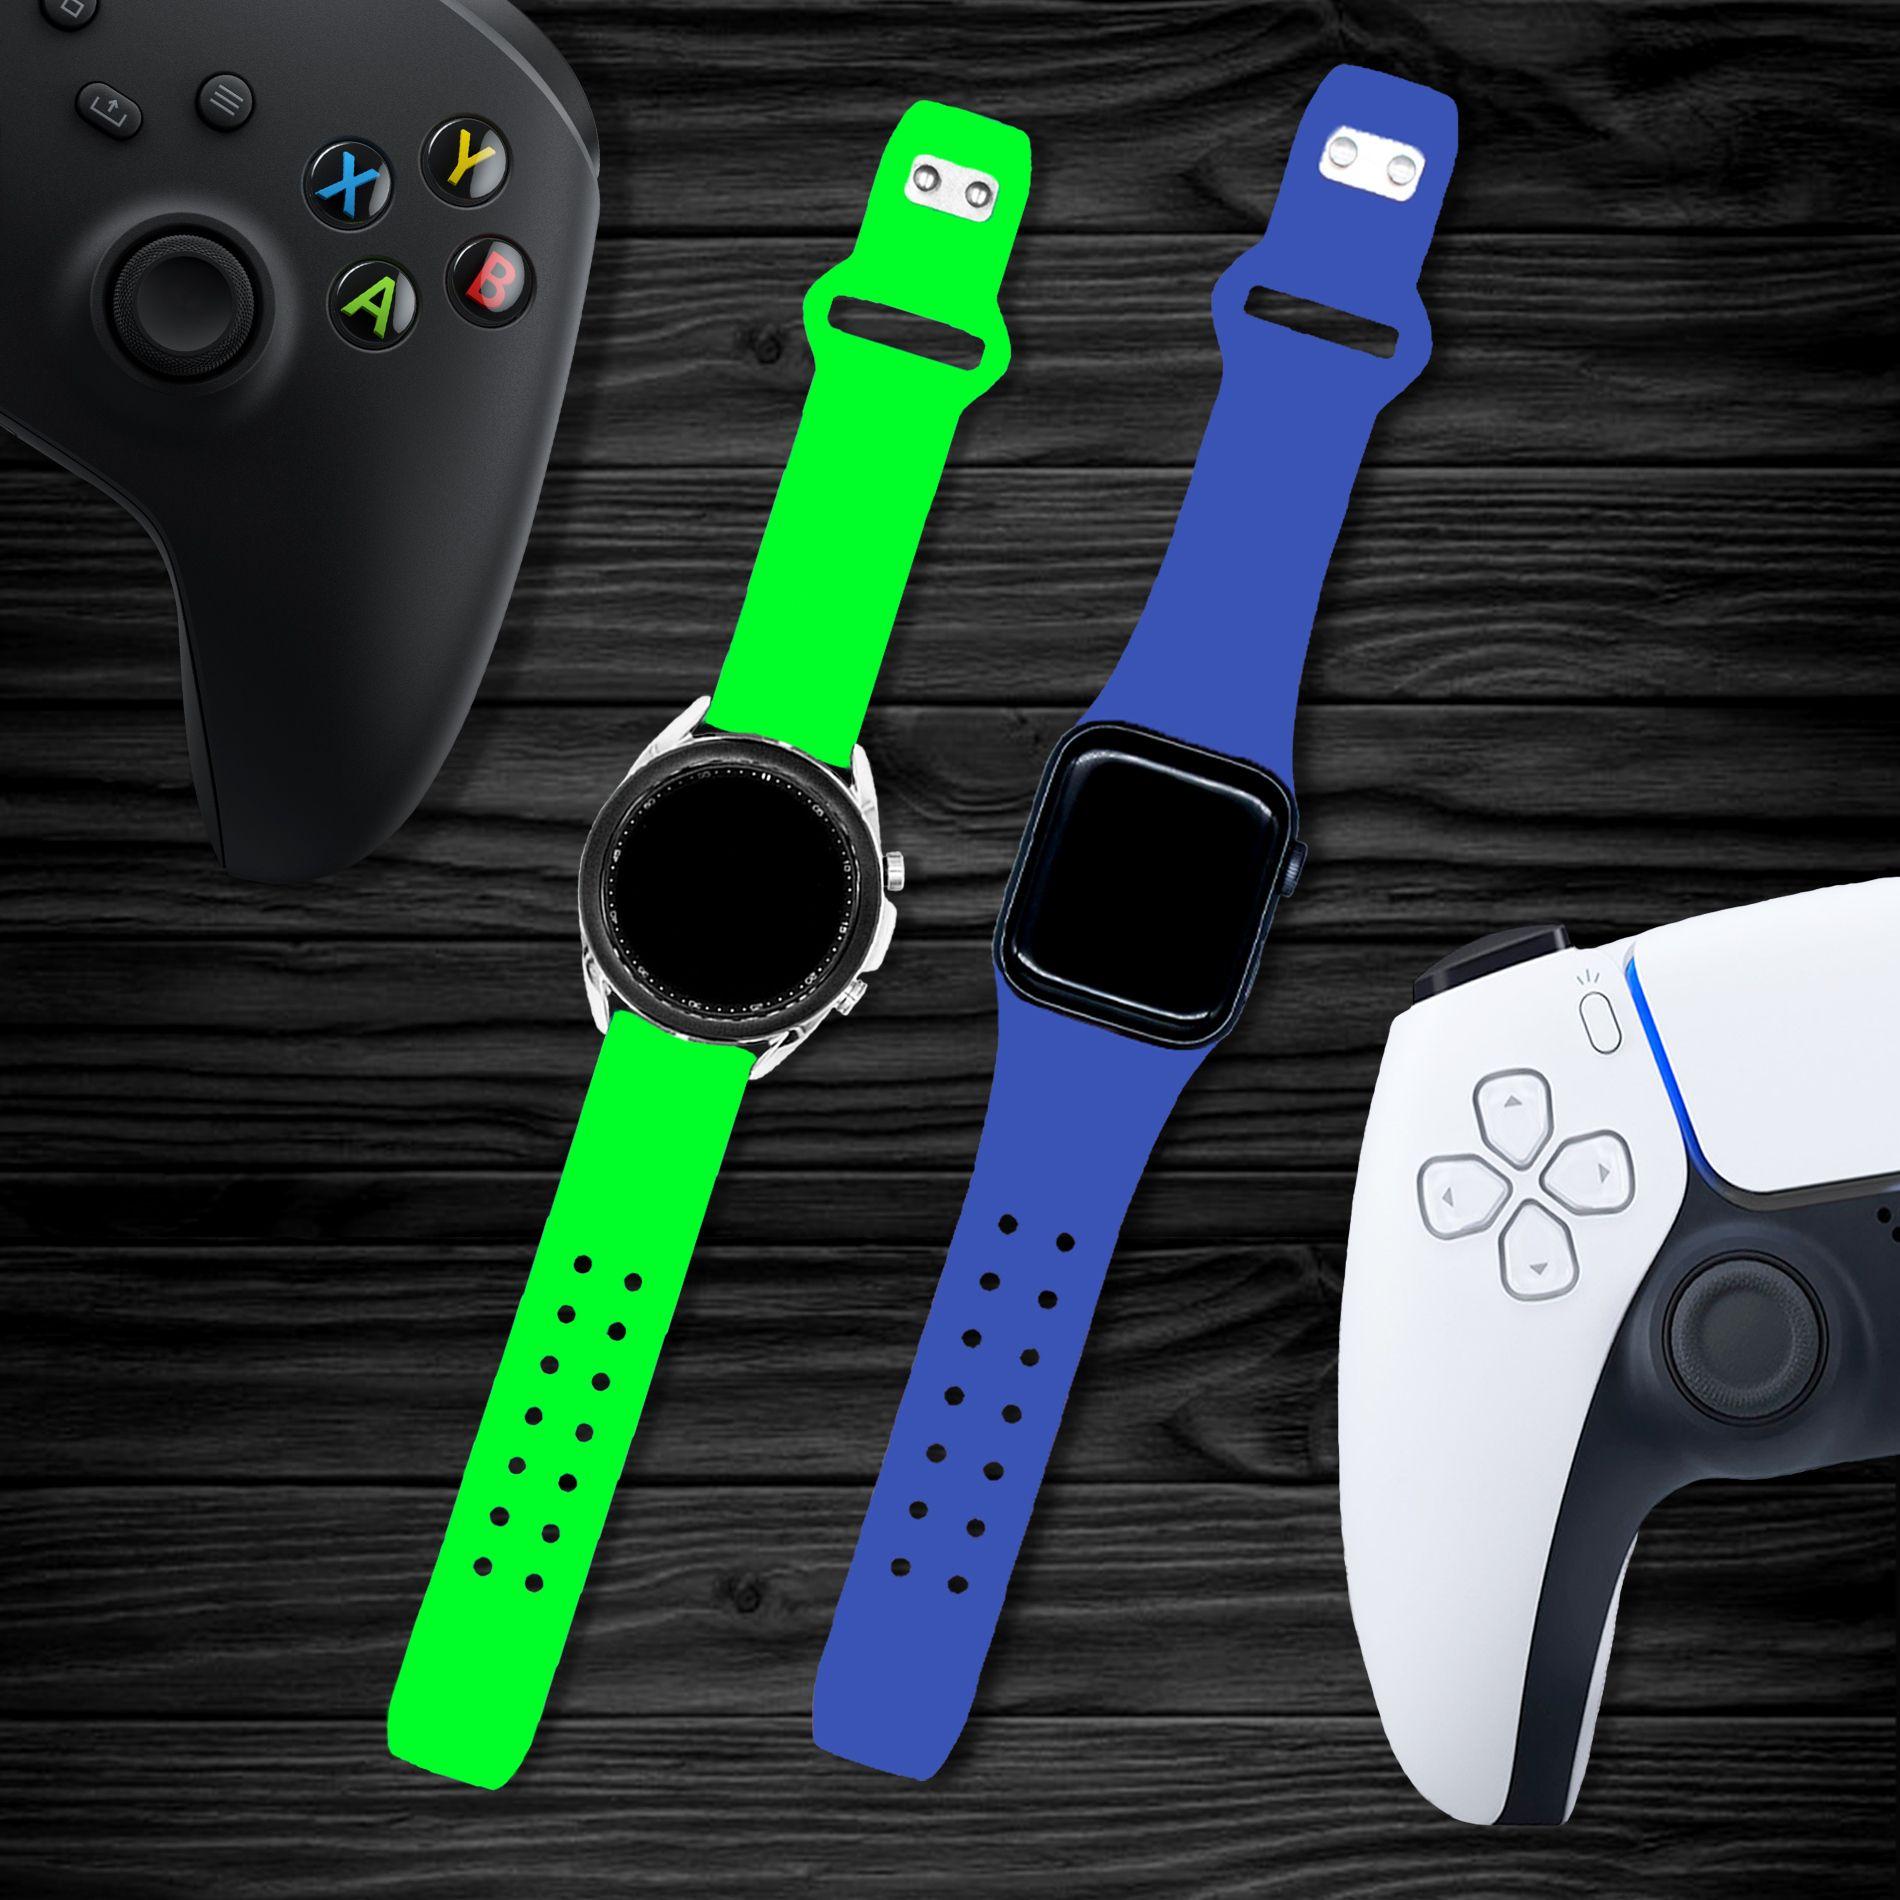 images?q=tbn:ANd9GcQh_l3eQ5xwiPy07kGEXjmjgmBKBRB7H2mRxCGhv1tFWg5c_mWT Smartwatch Xbox